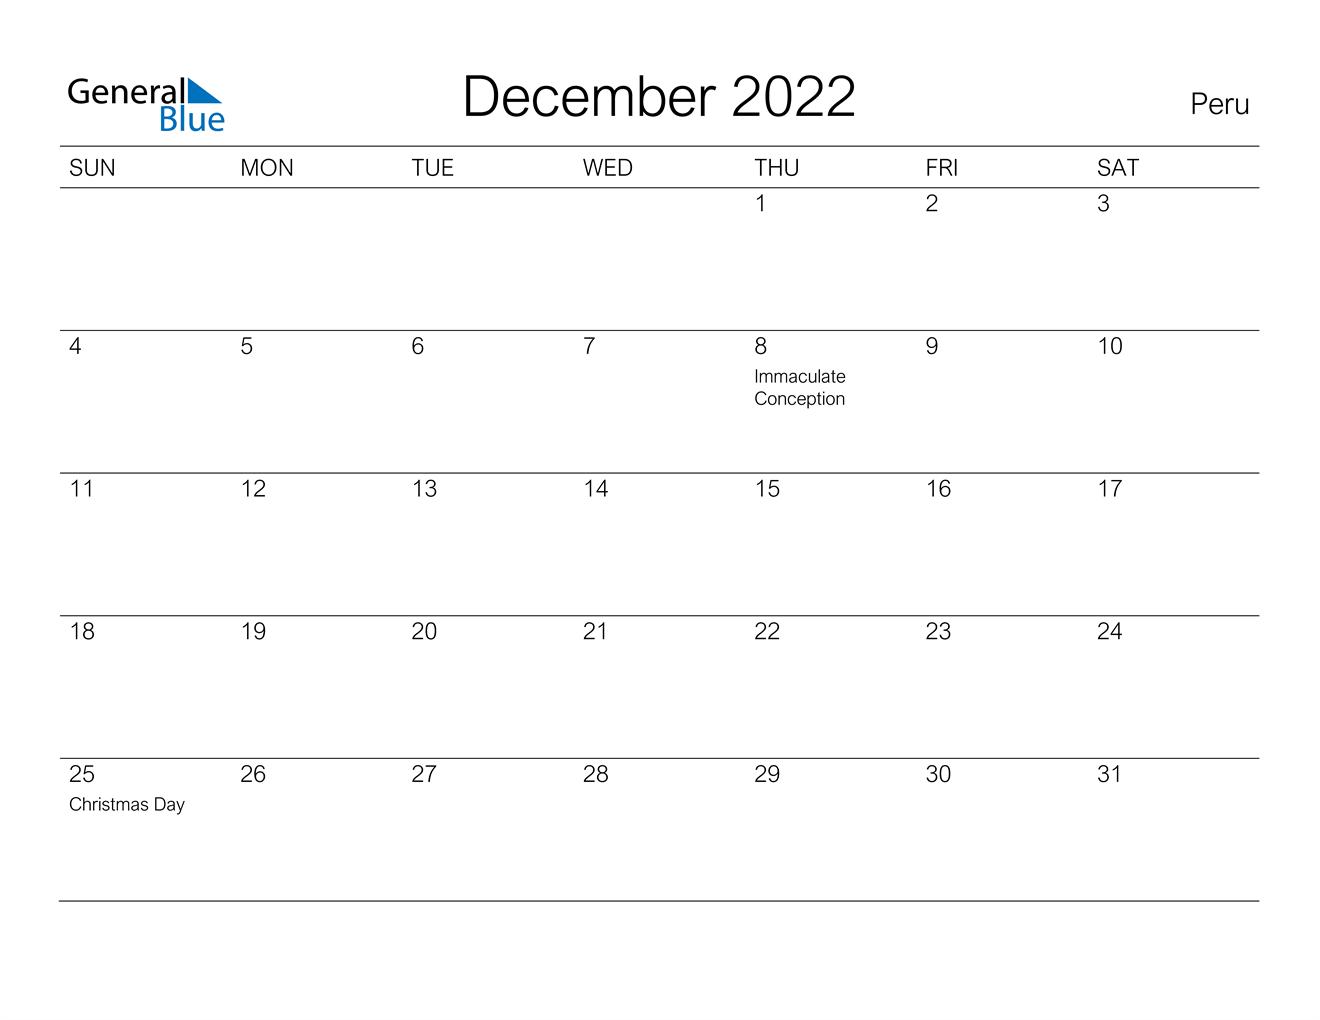 December 2022 Calendar - Peru